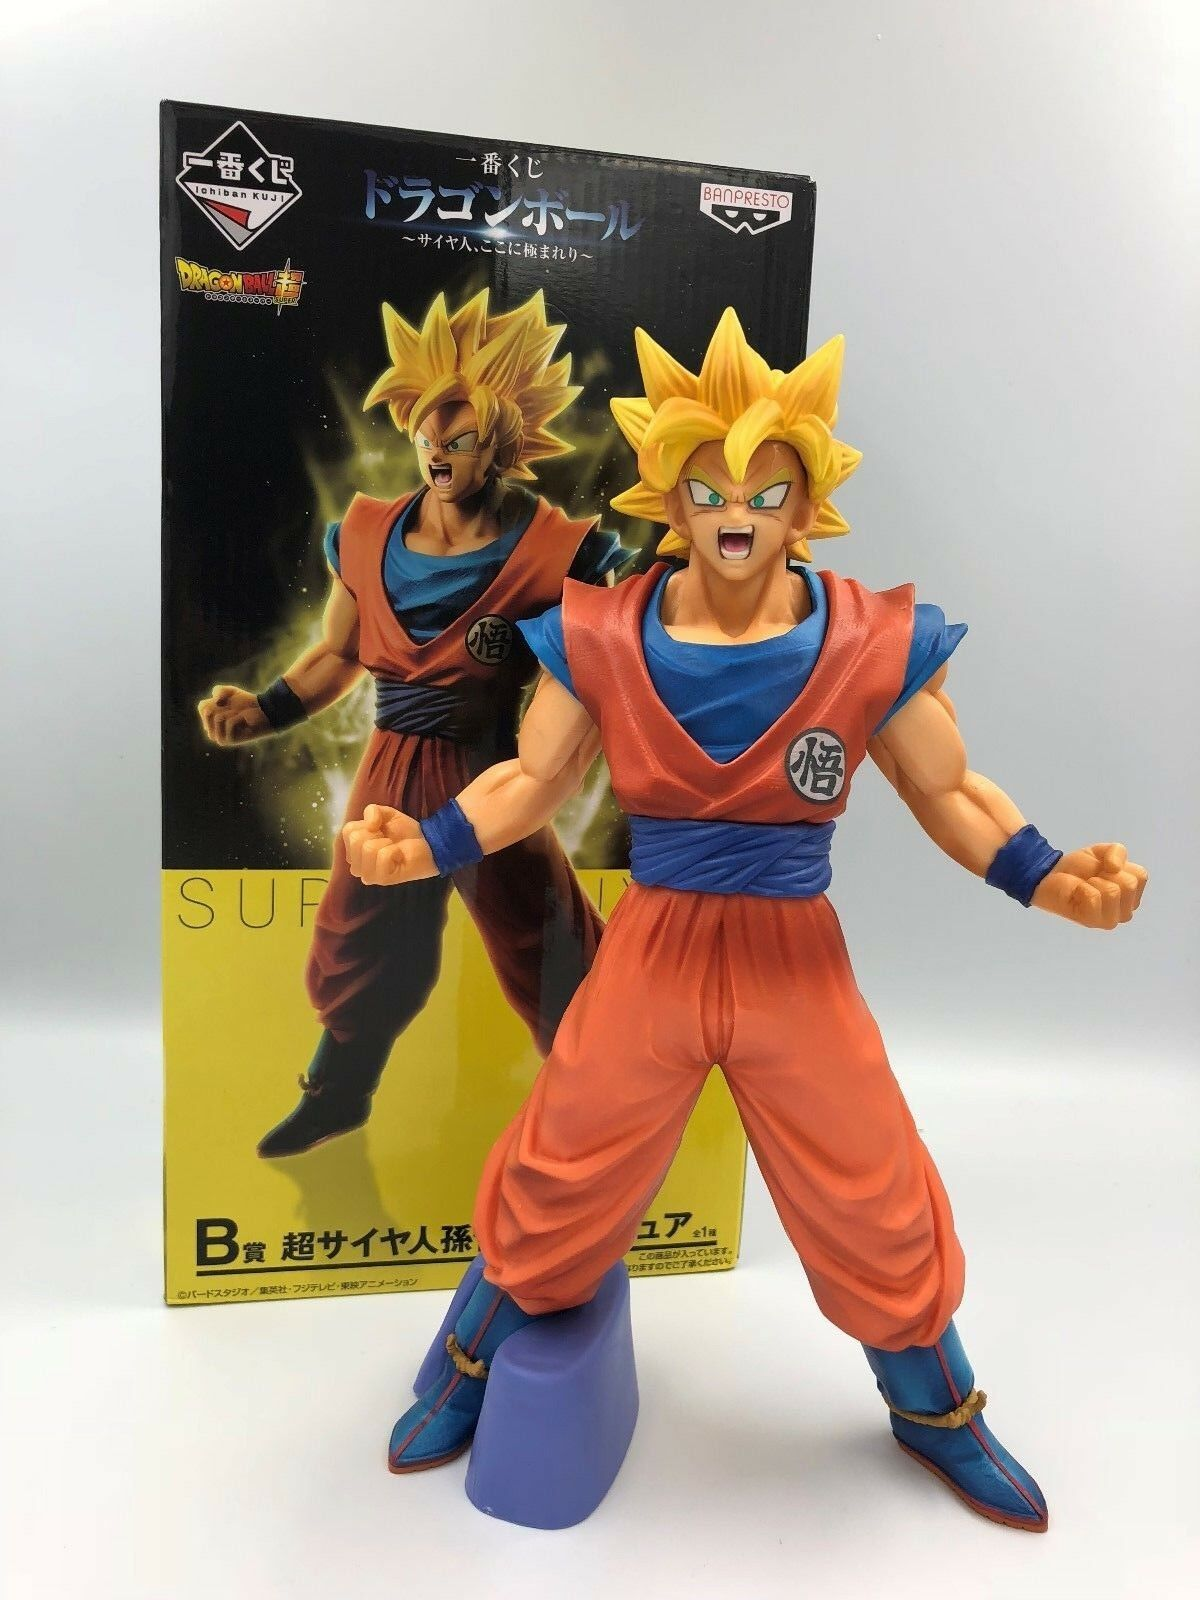 Dragon Ball Ichiban Kuji Prize Last Son Goku//Gokou Figure SS God Super Saiyan BANPRESTO by Banpresto